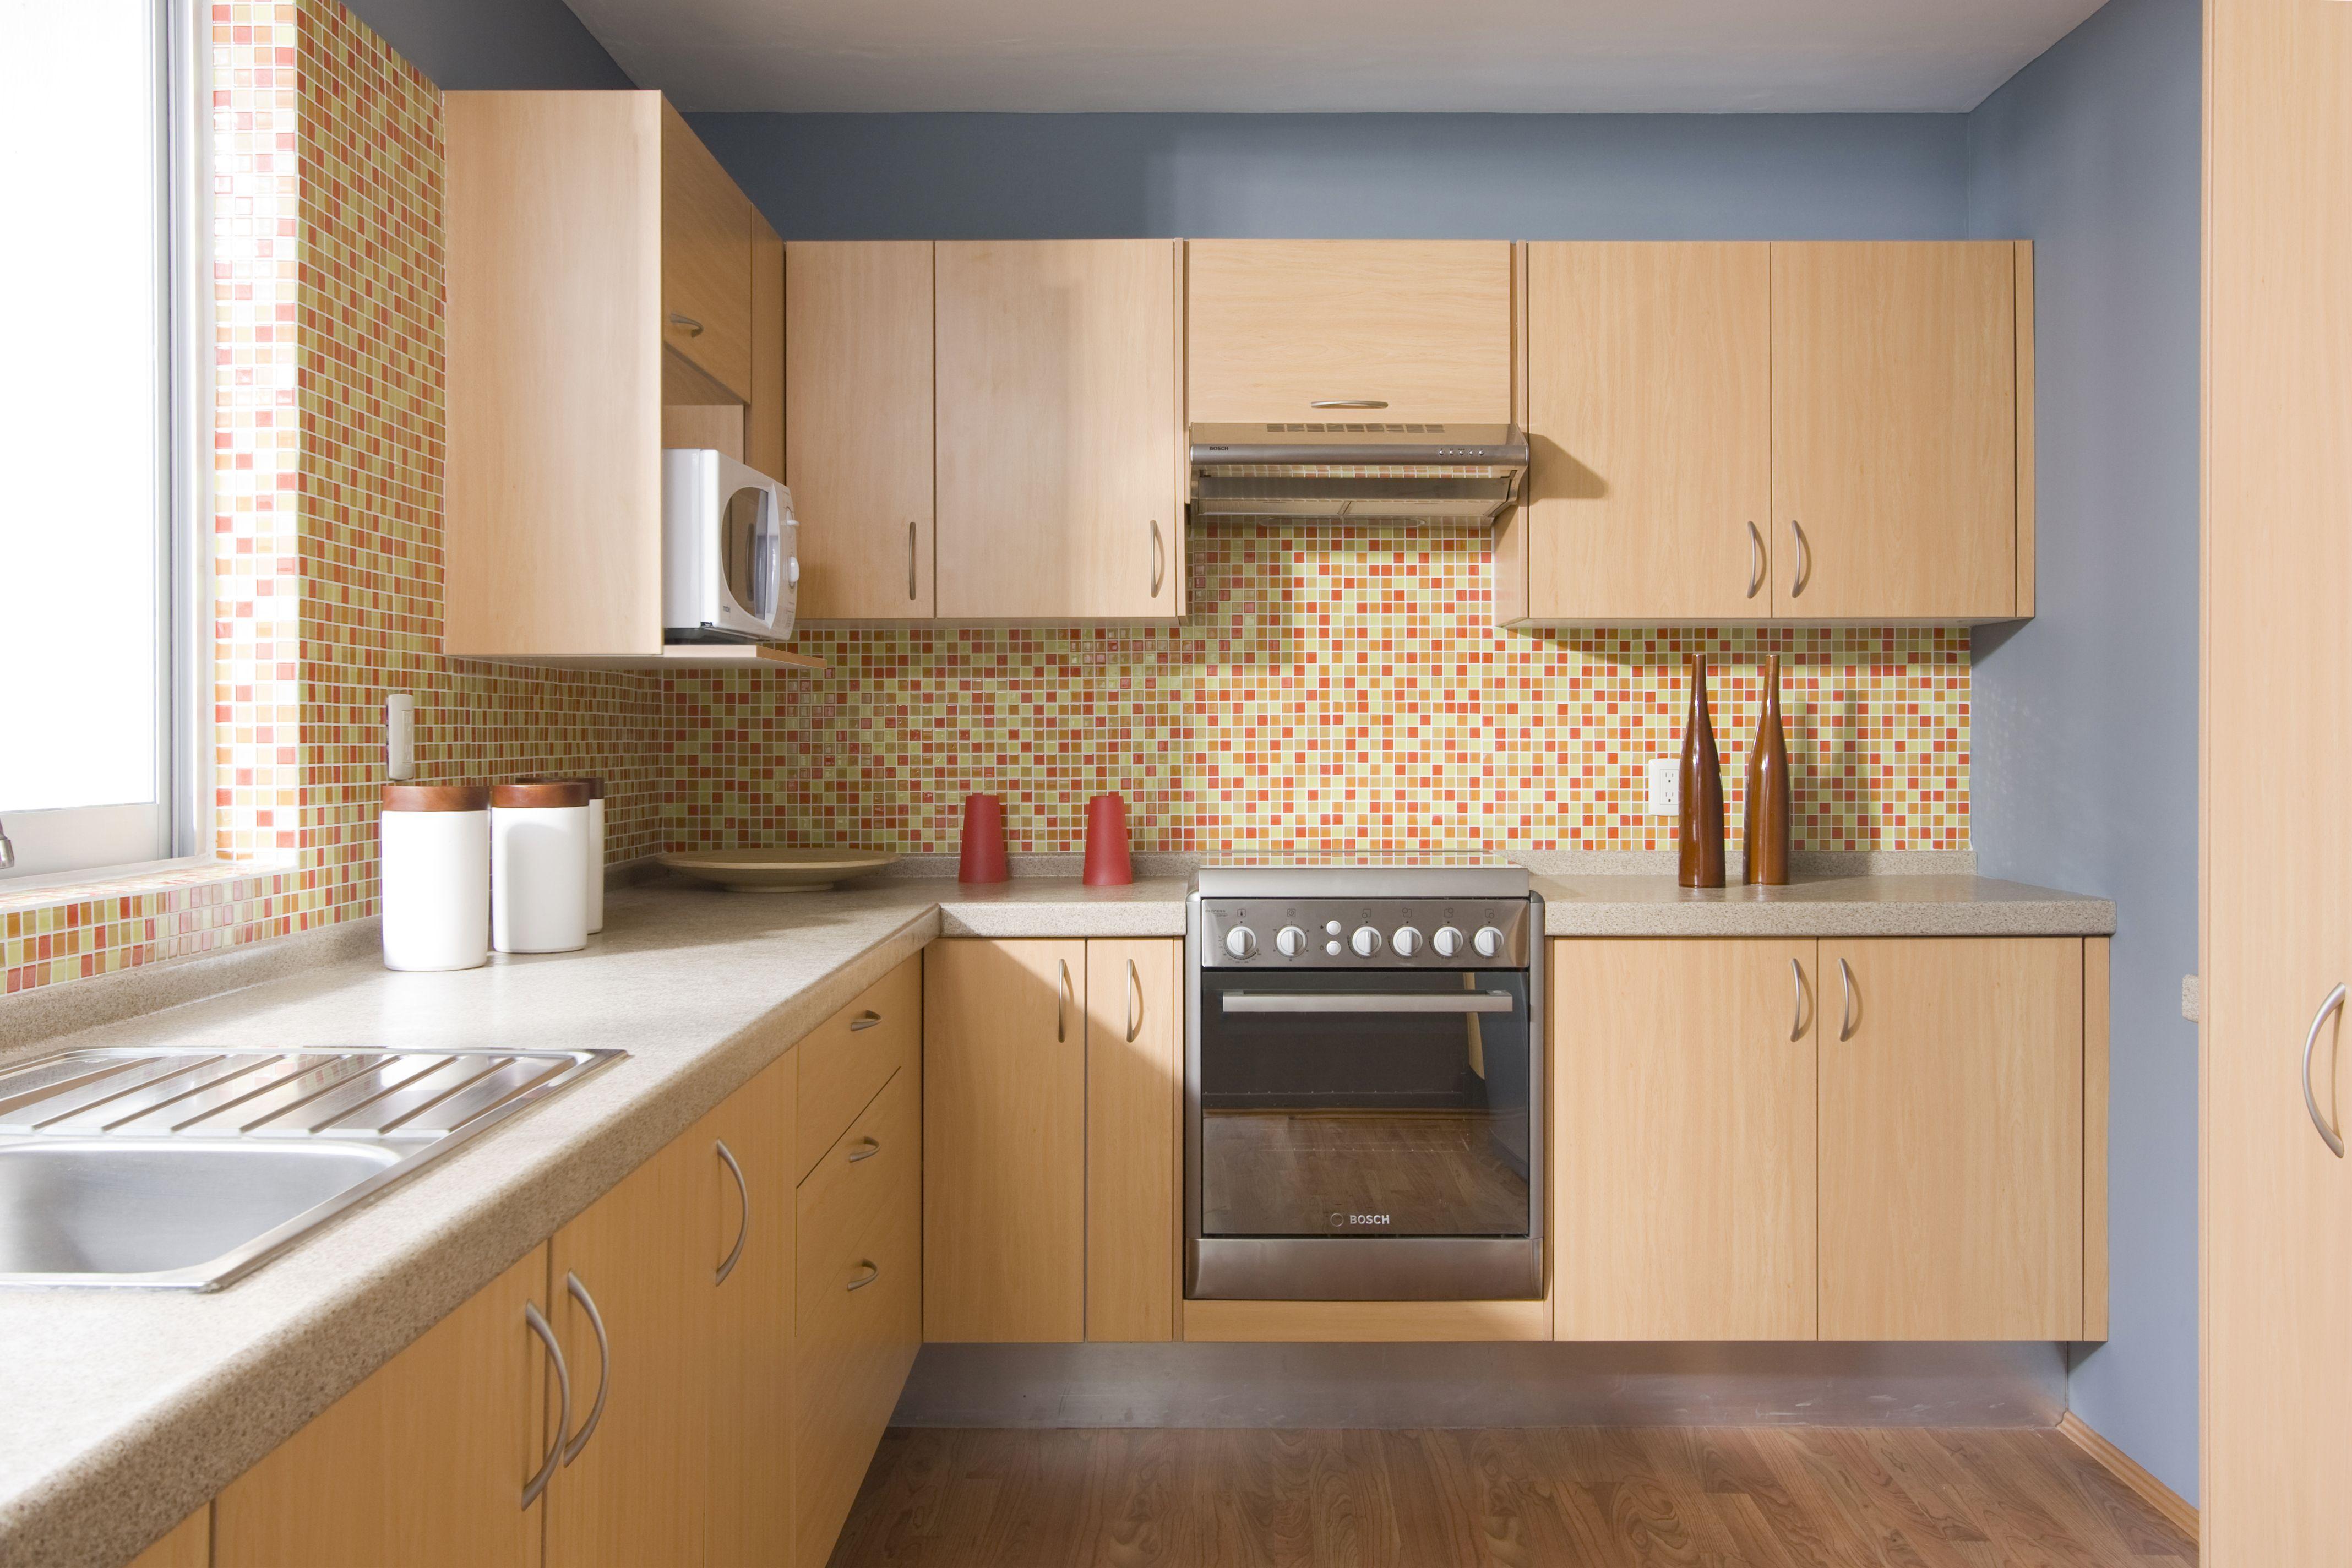 Dise ar mi cocina en 3d gratis casa dise o for Como disenar una casa en 3d